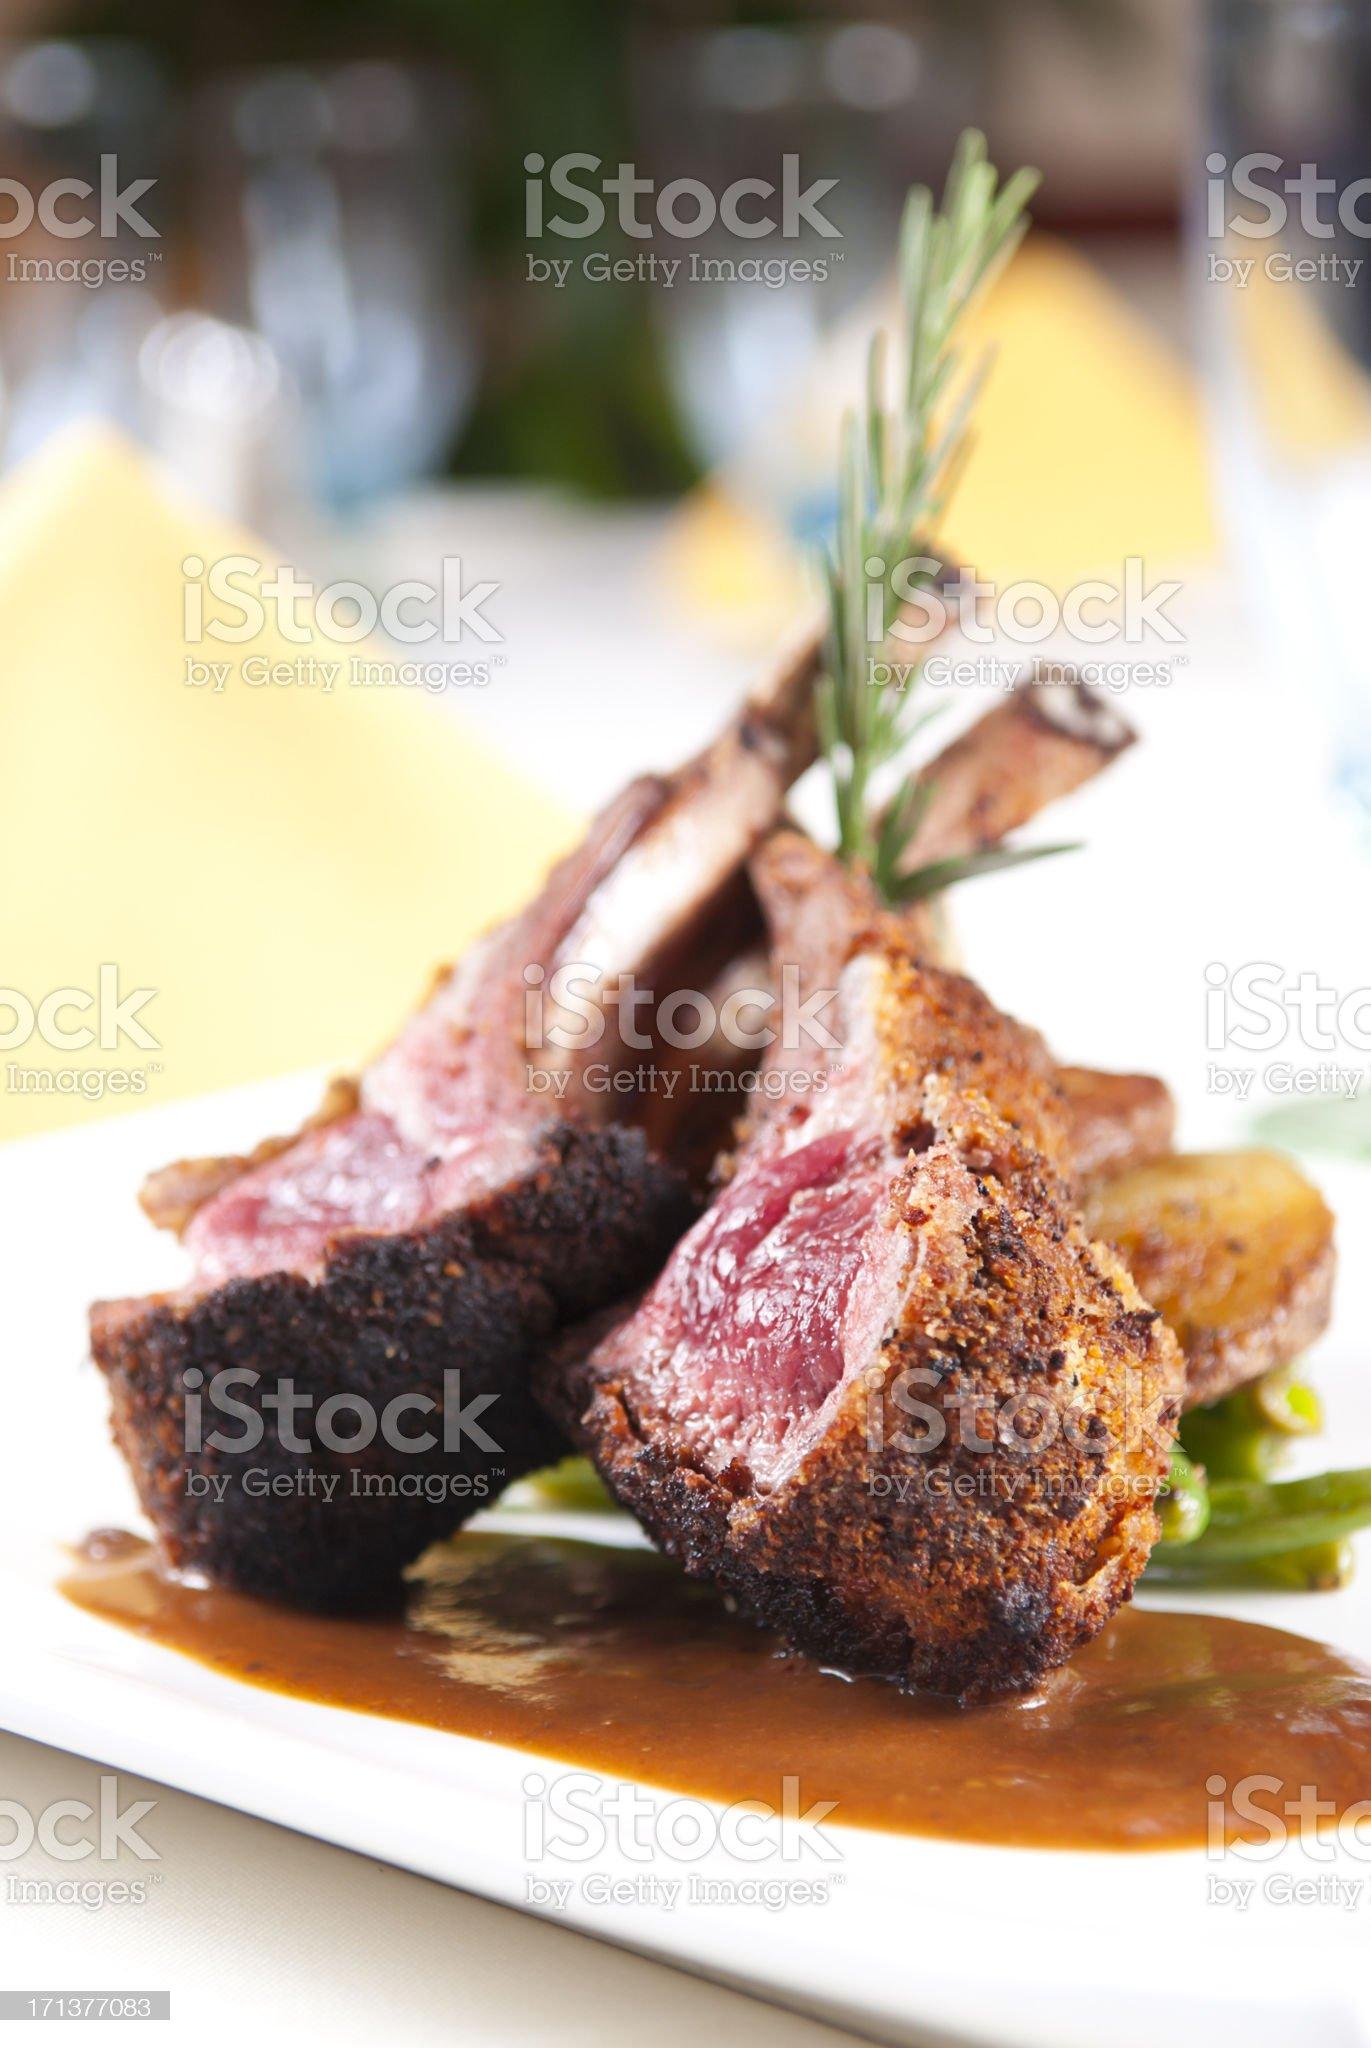 Close-up of a gourmet-style lambchop dish royalty-free stock photo